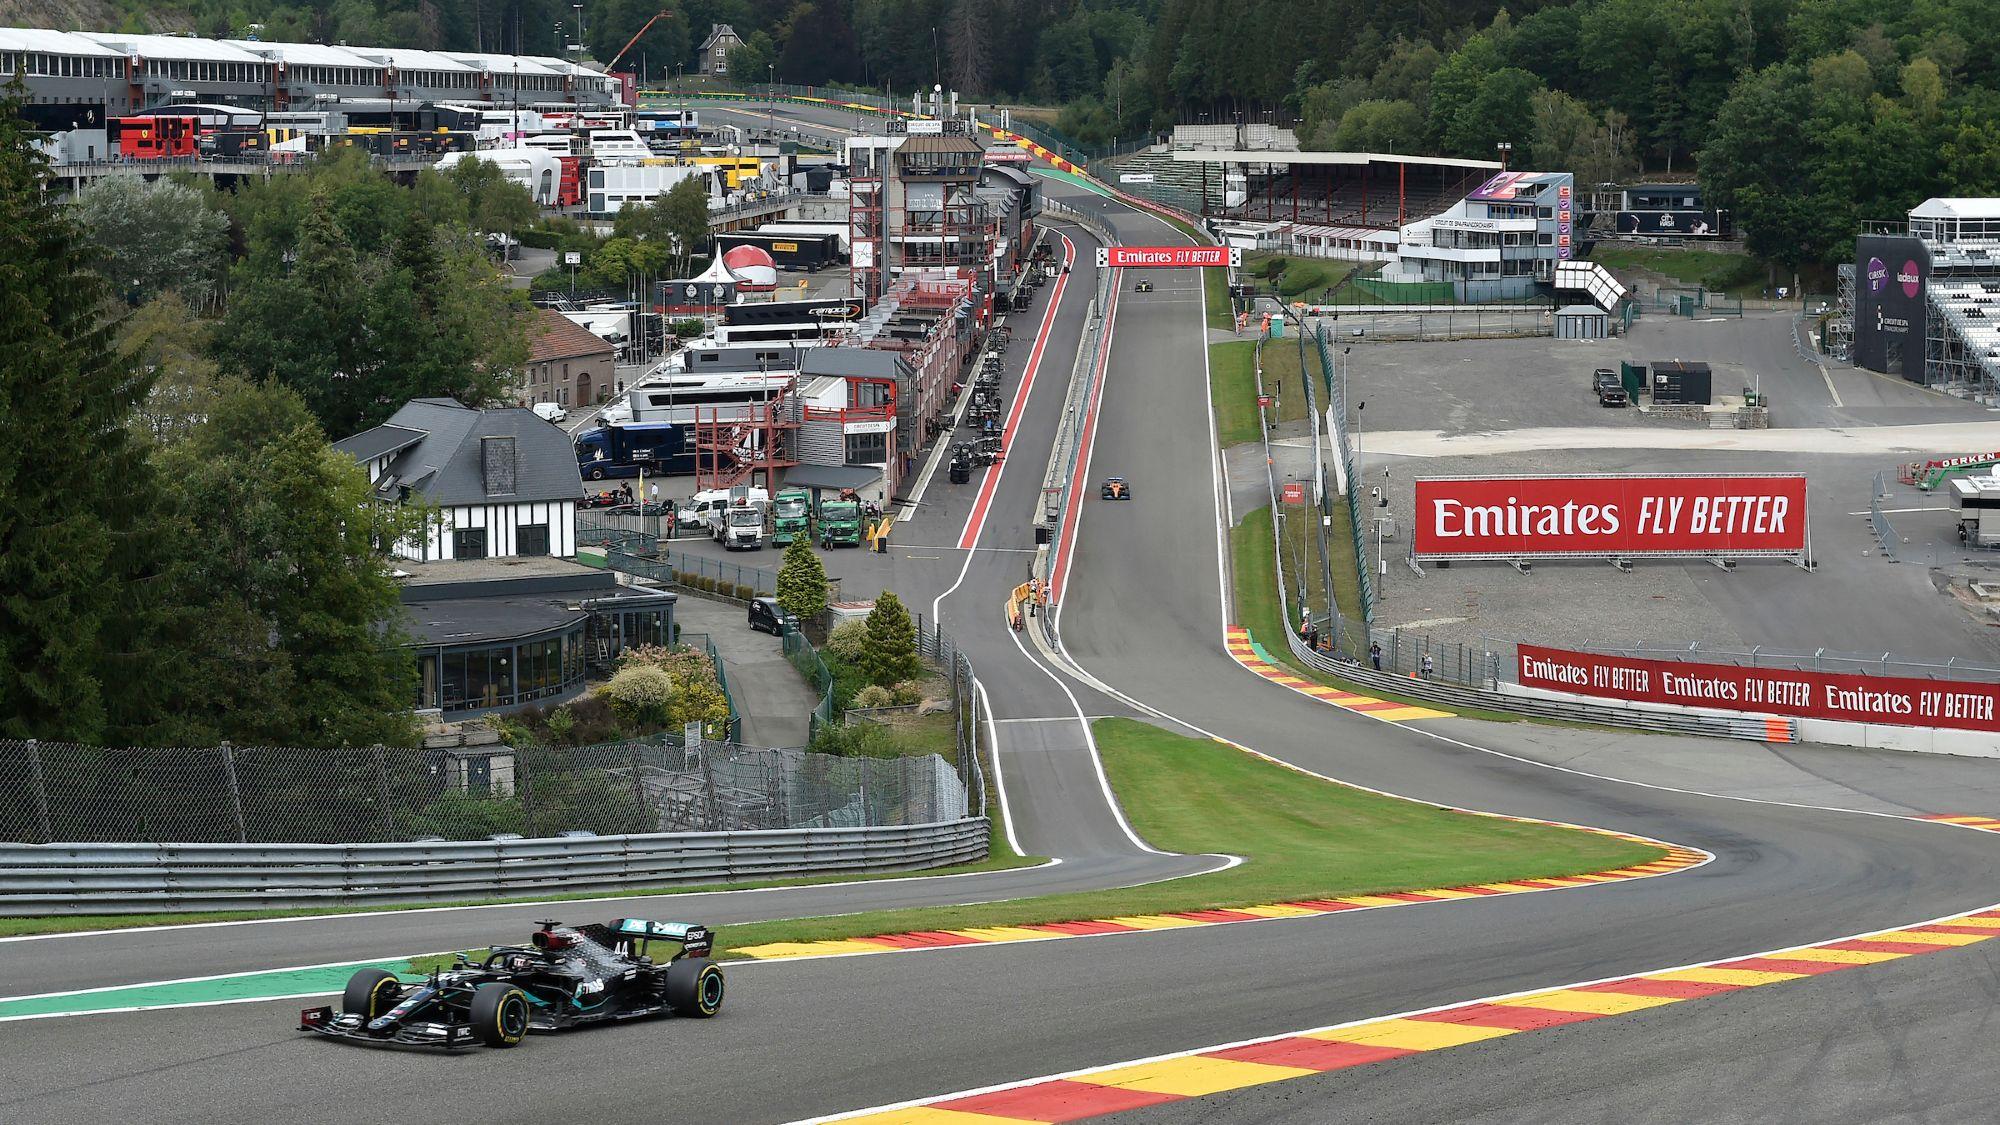 Lewis Hamilton, 2020 Belgian GP